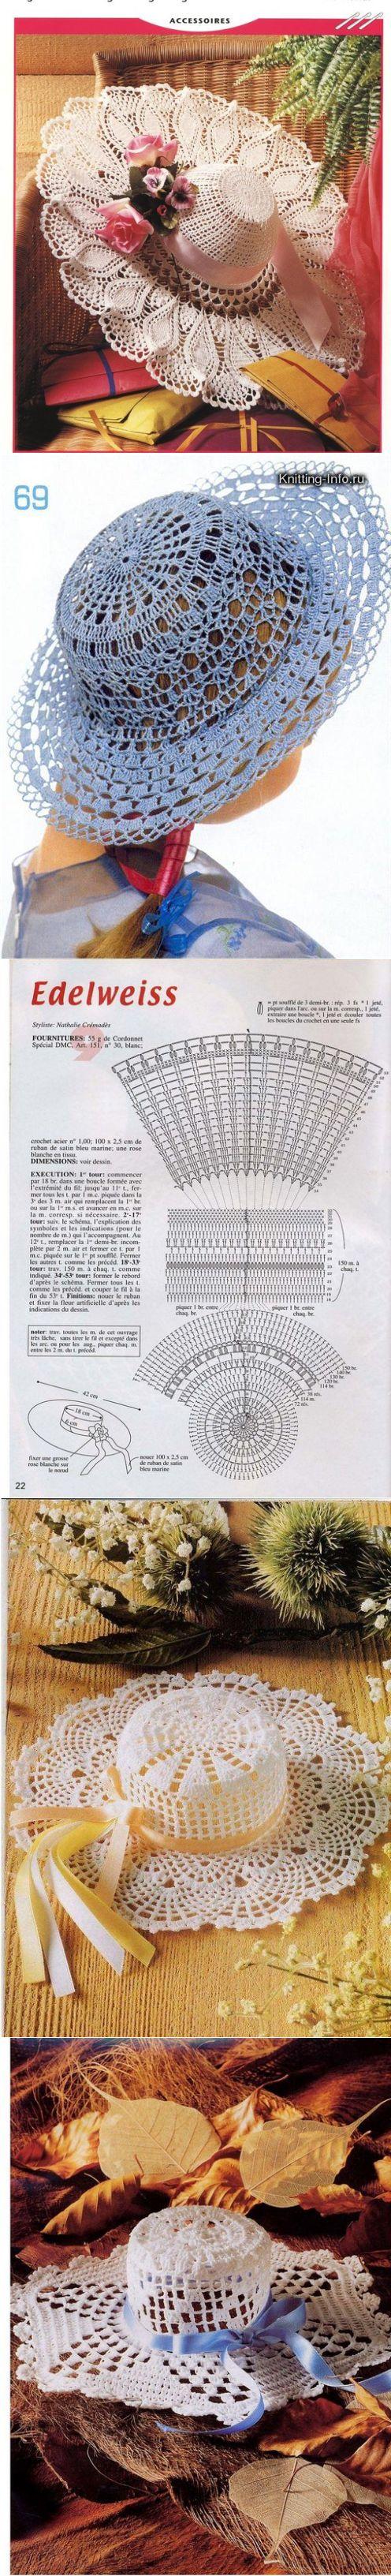 схема вязания панамы на мальчика 2-х лет крючком